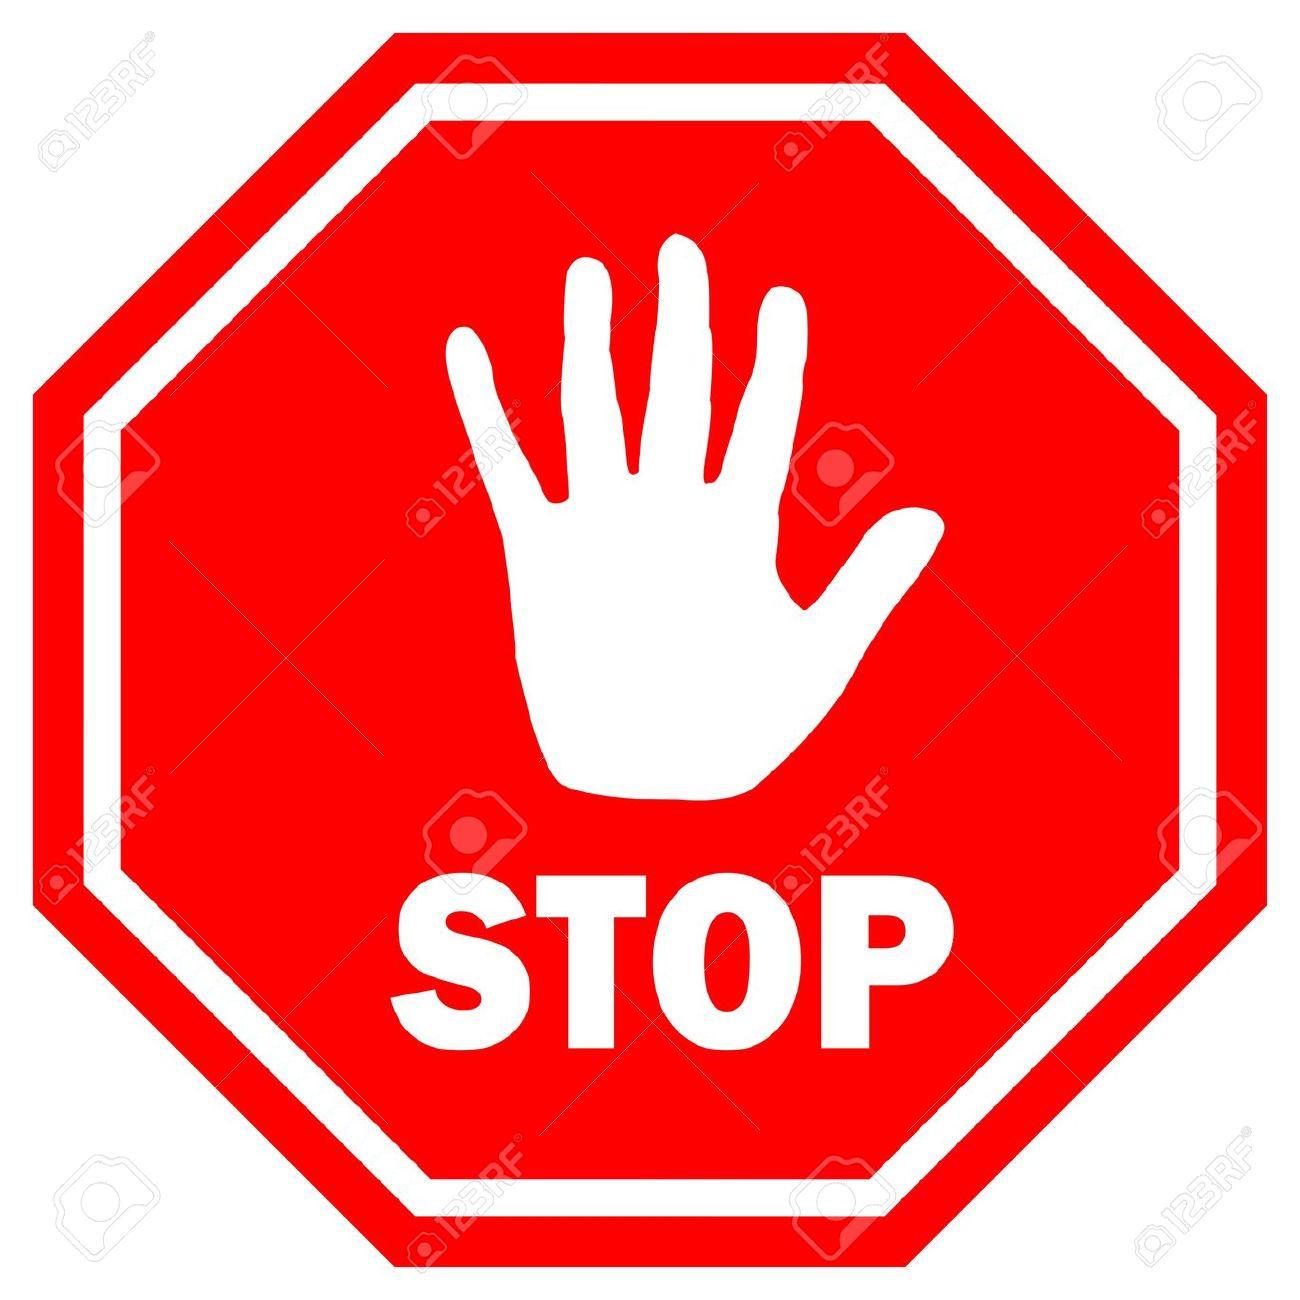 Stop signs clip art tumundografico